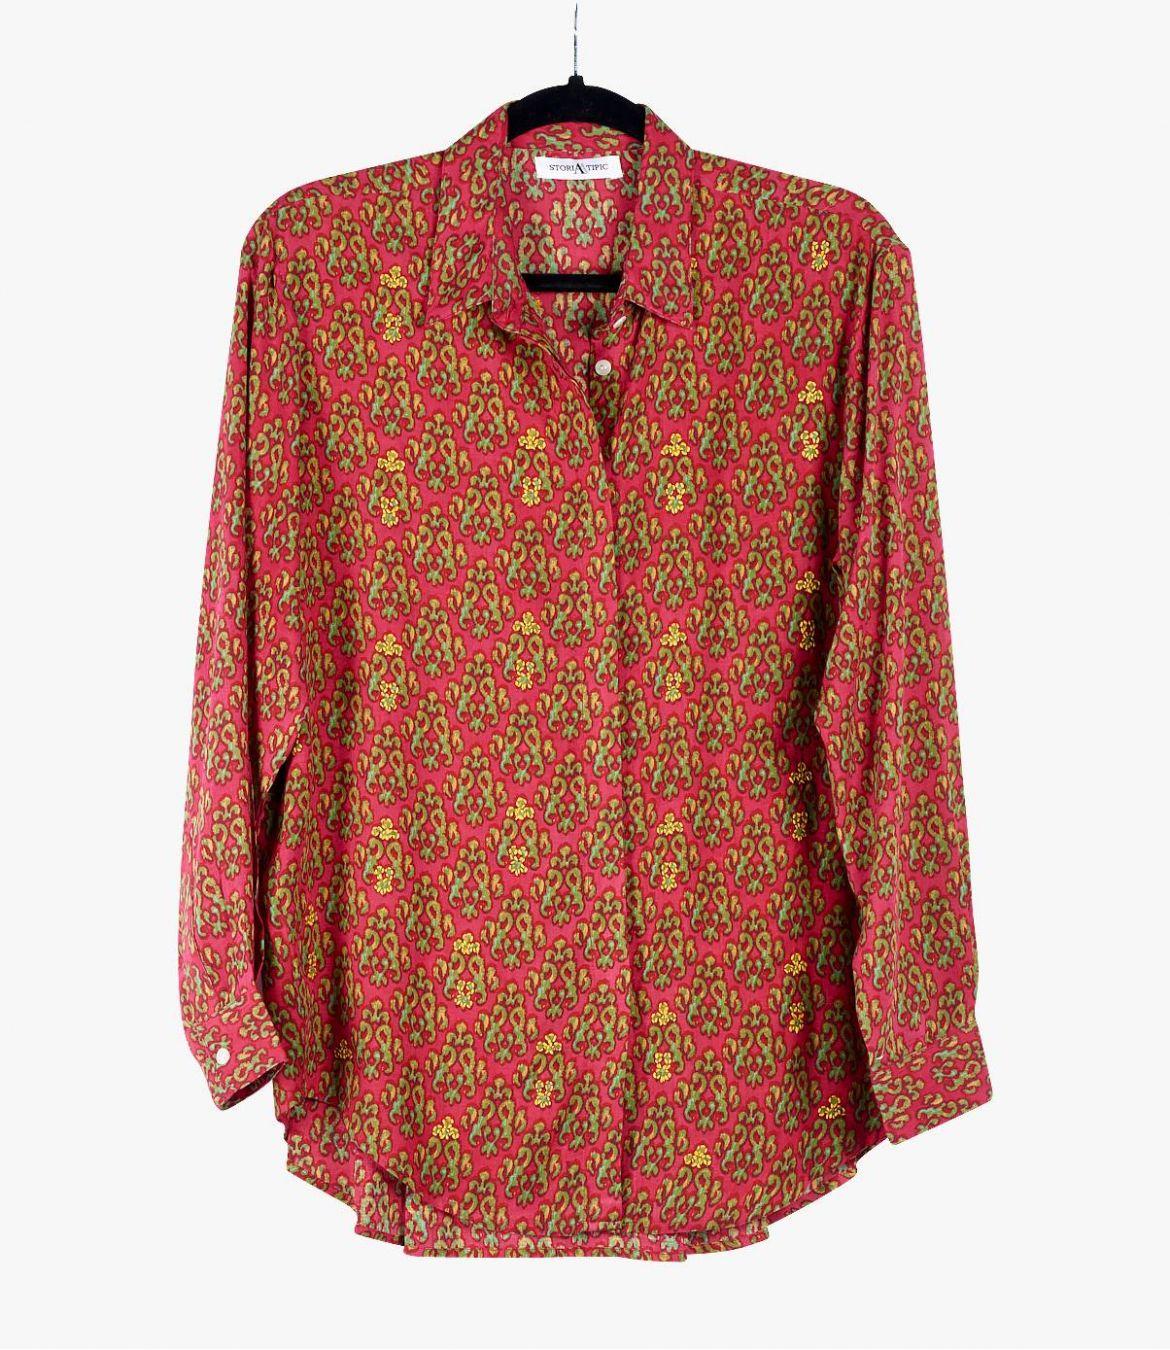 CARI KISS Women's Modal Shirt Storiatipic - 1